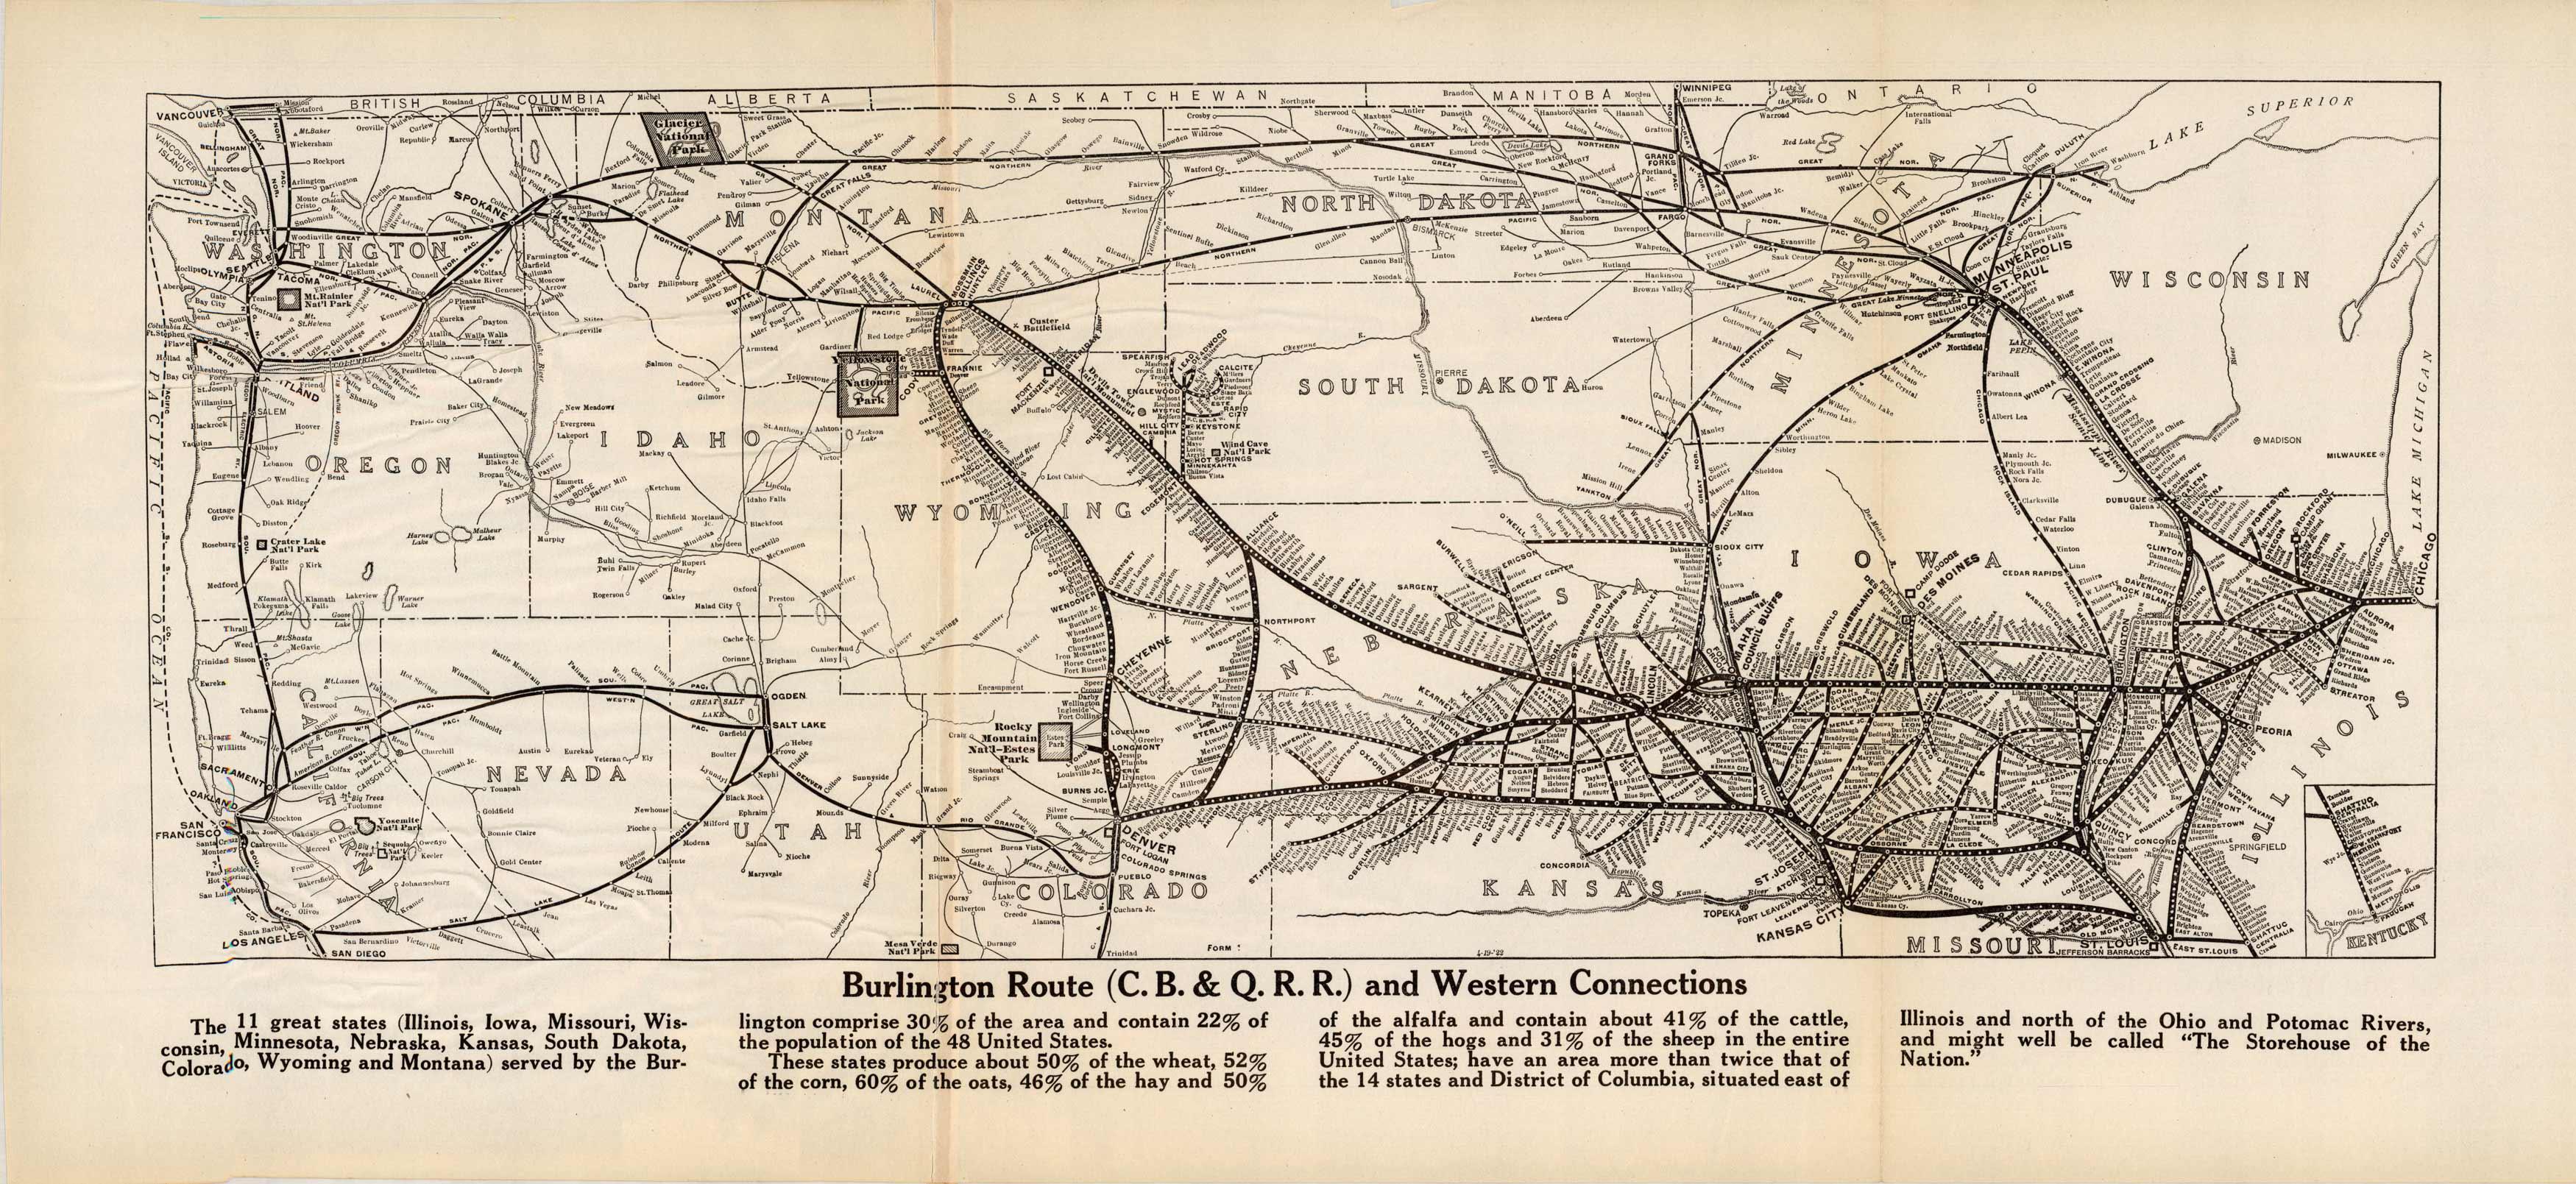 Burlington Route (C.B. & Q.R.R.) and Western Connections